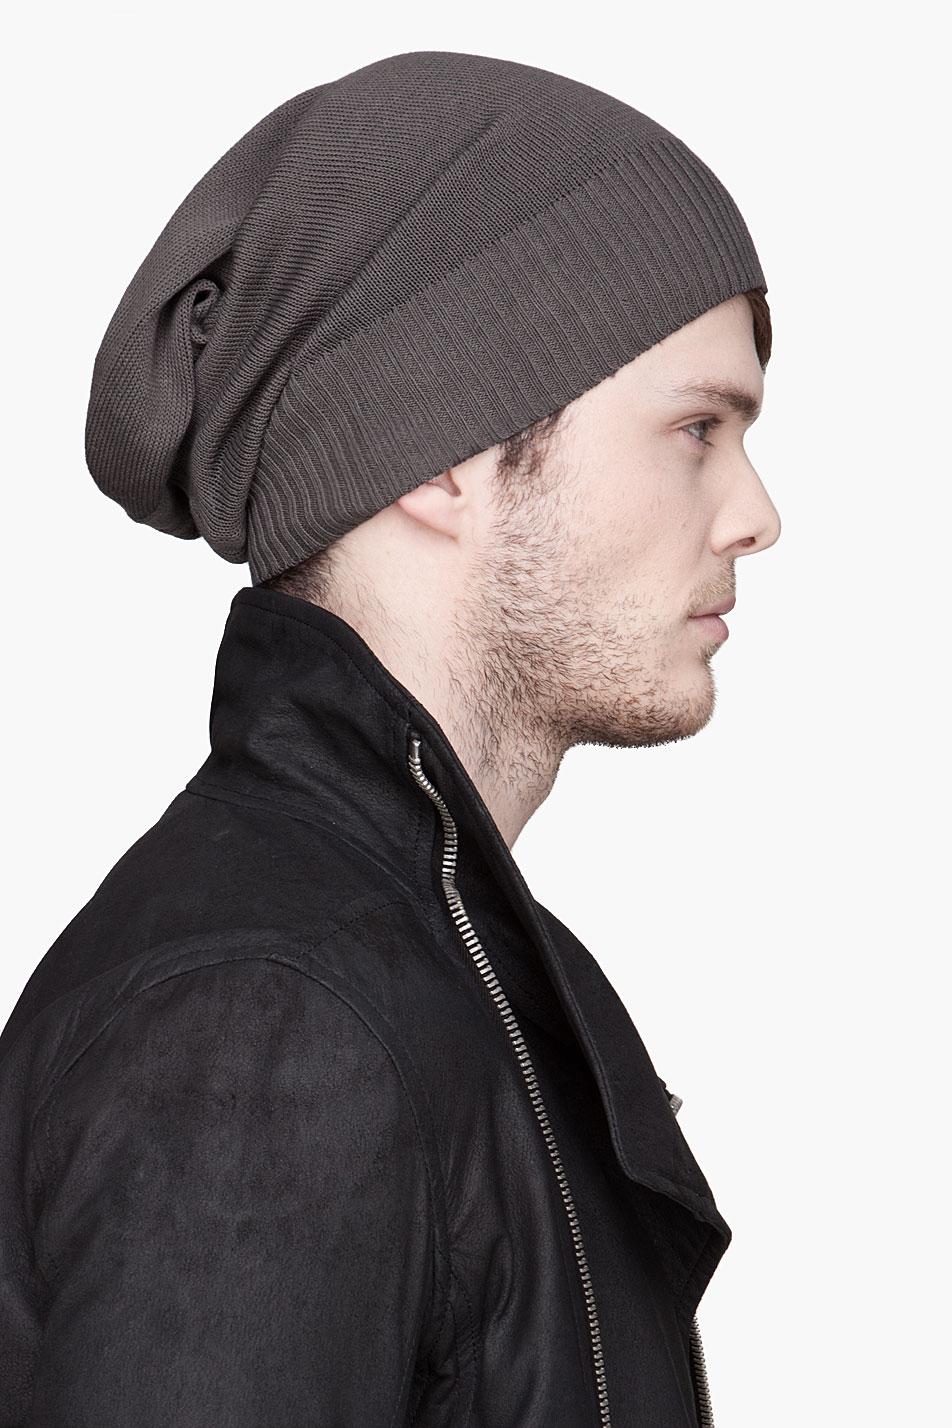 67525e05a03b4 Rick Owens BNWT PLINTH MERINO BEANIE Size one size - Hats for Sale - Grailed